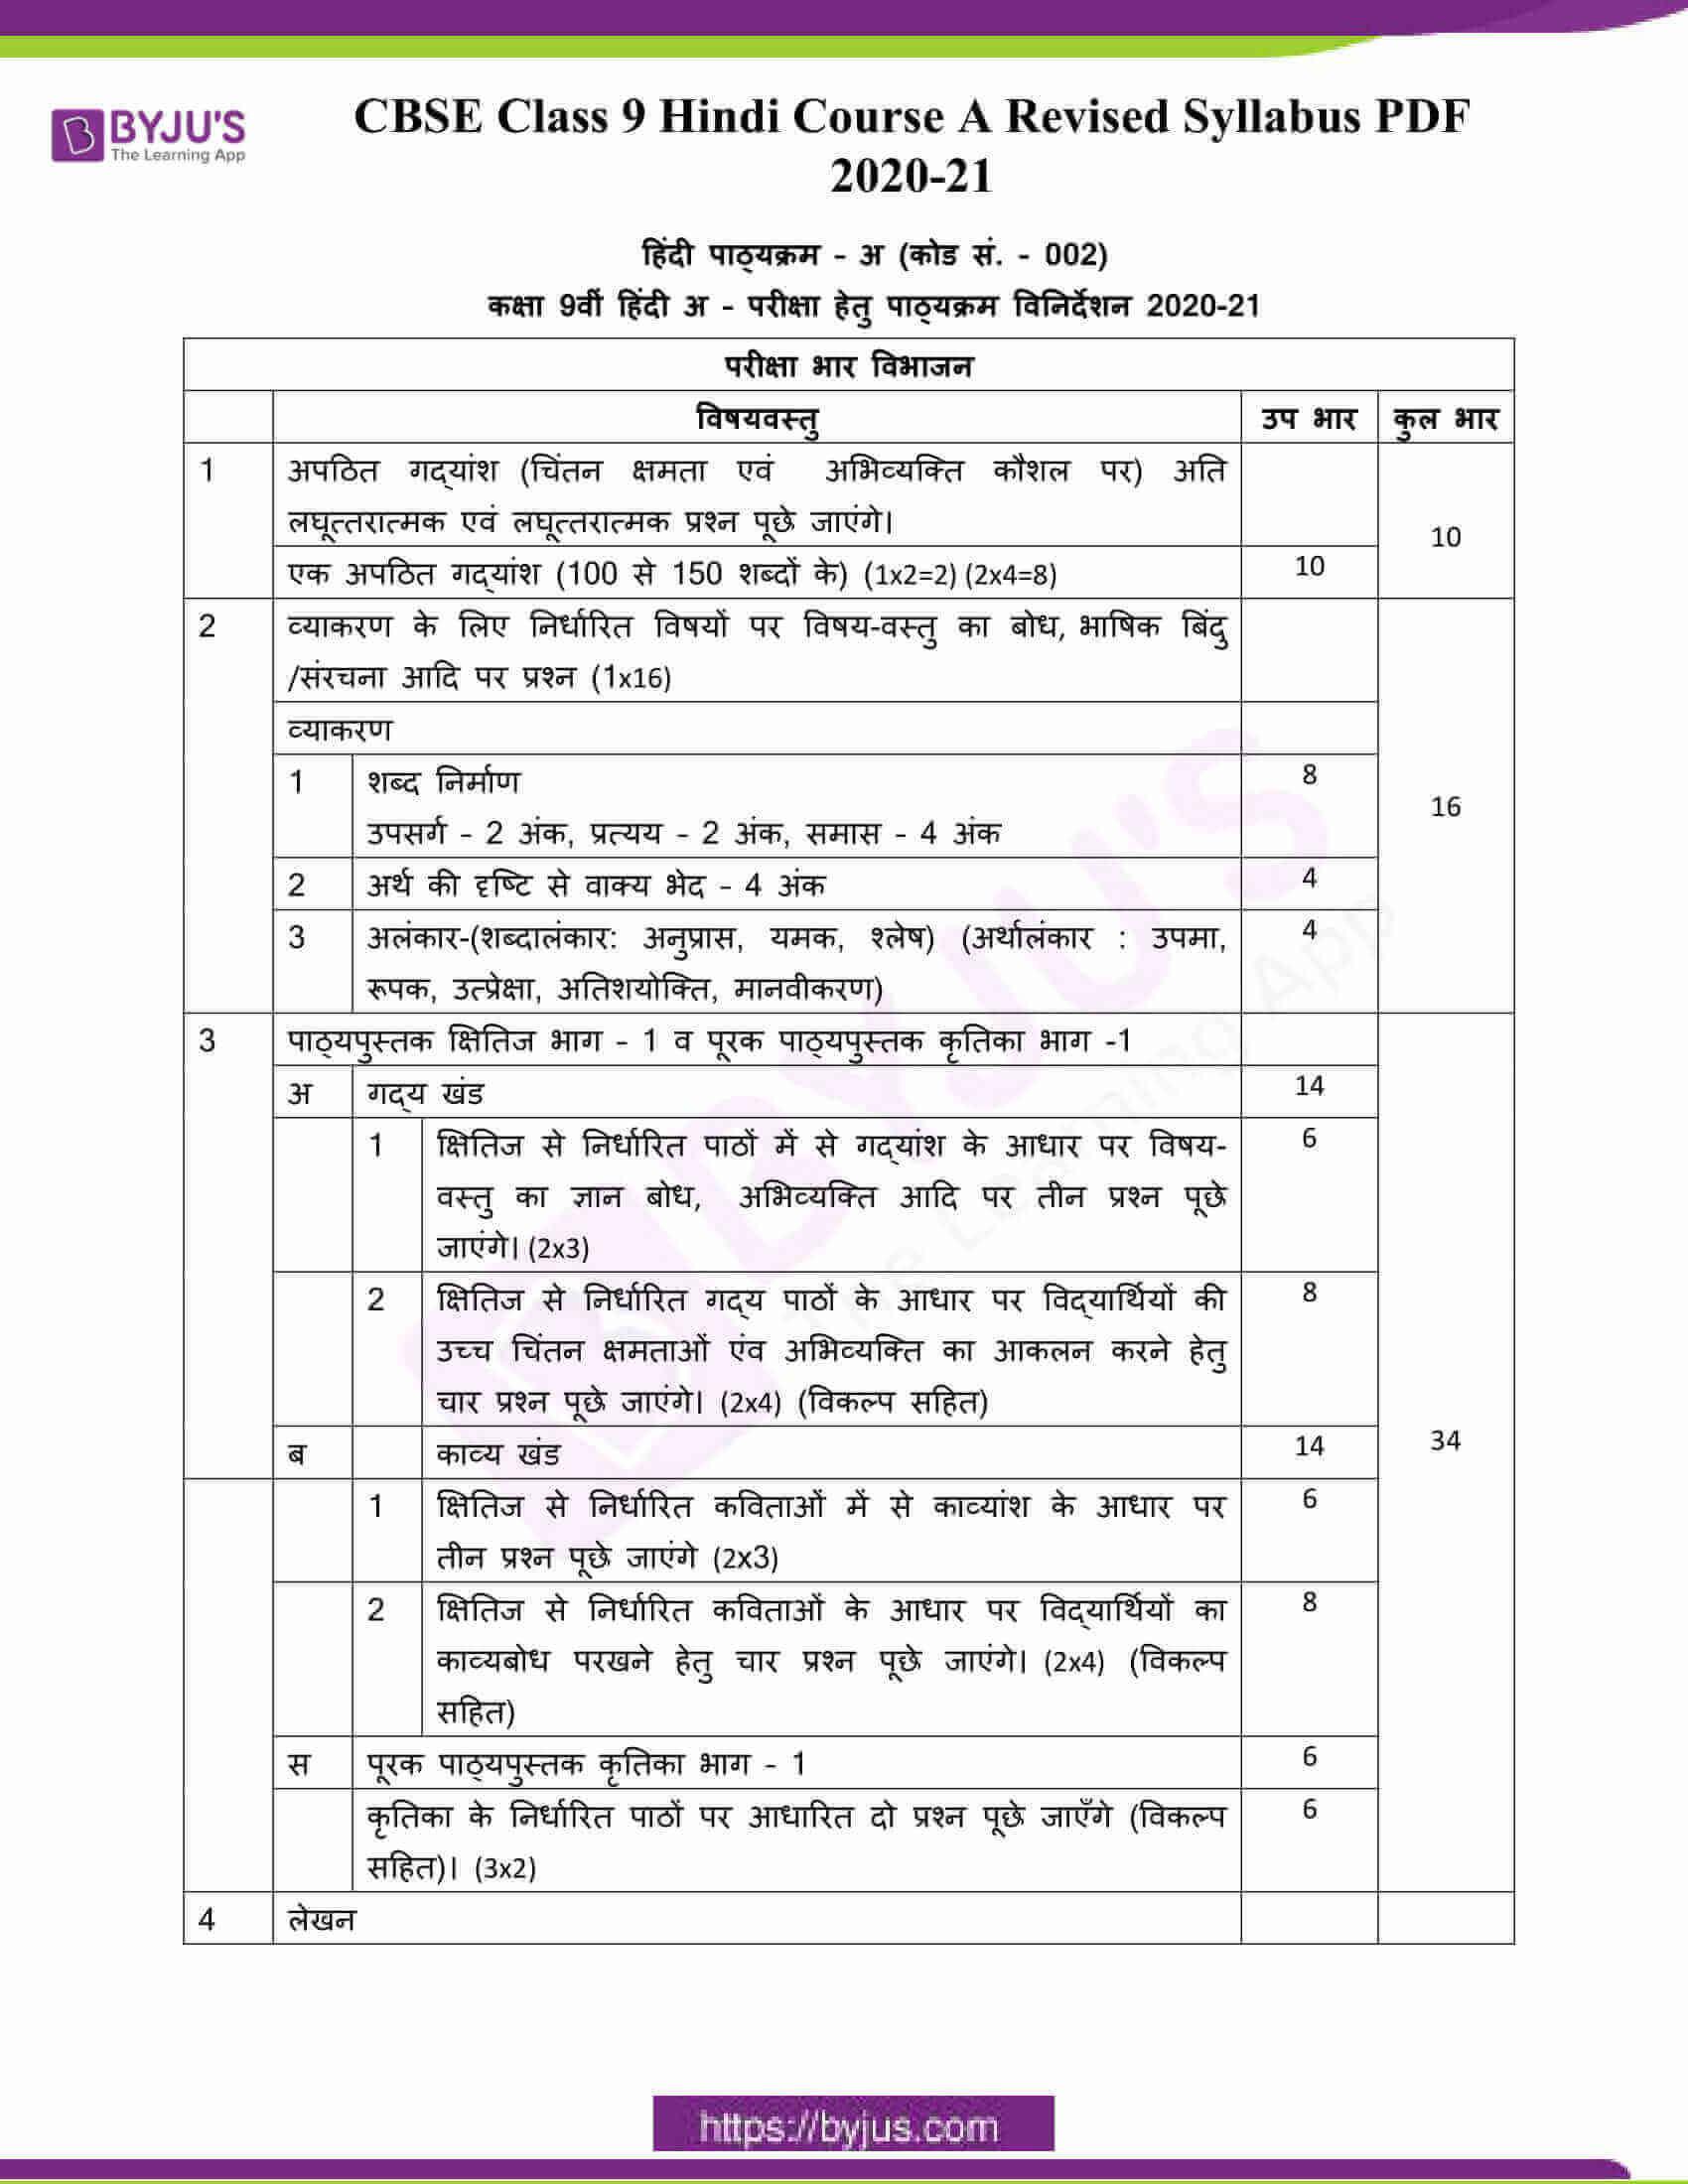 CBSE Class 9 Hindi Course A Revised Syllabus PDF 2020 21 1